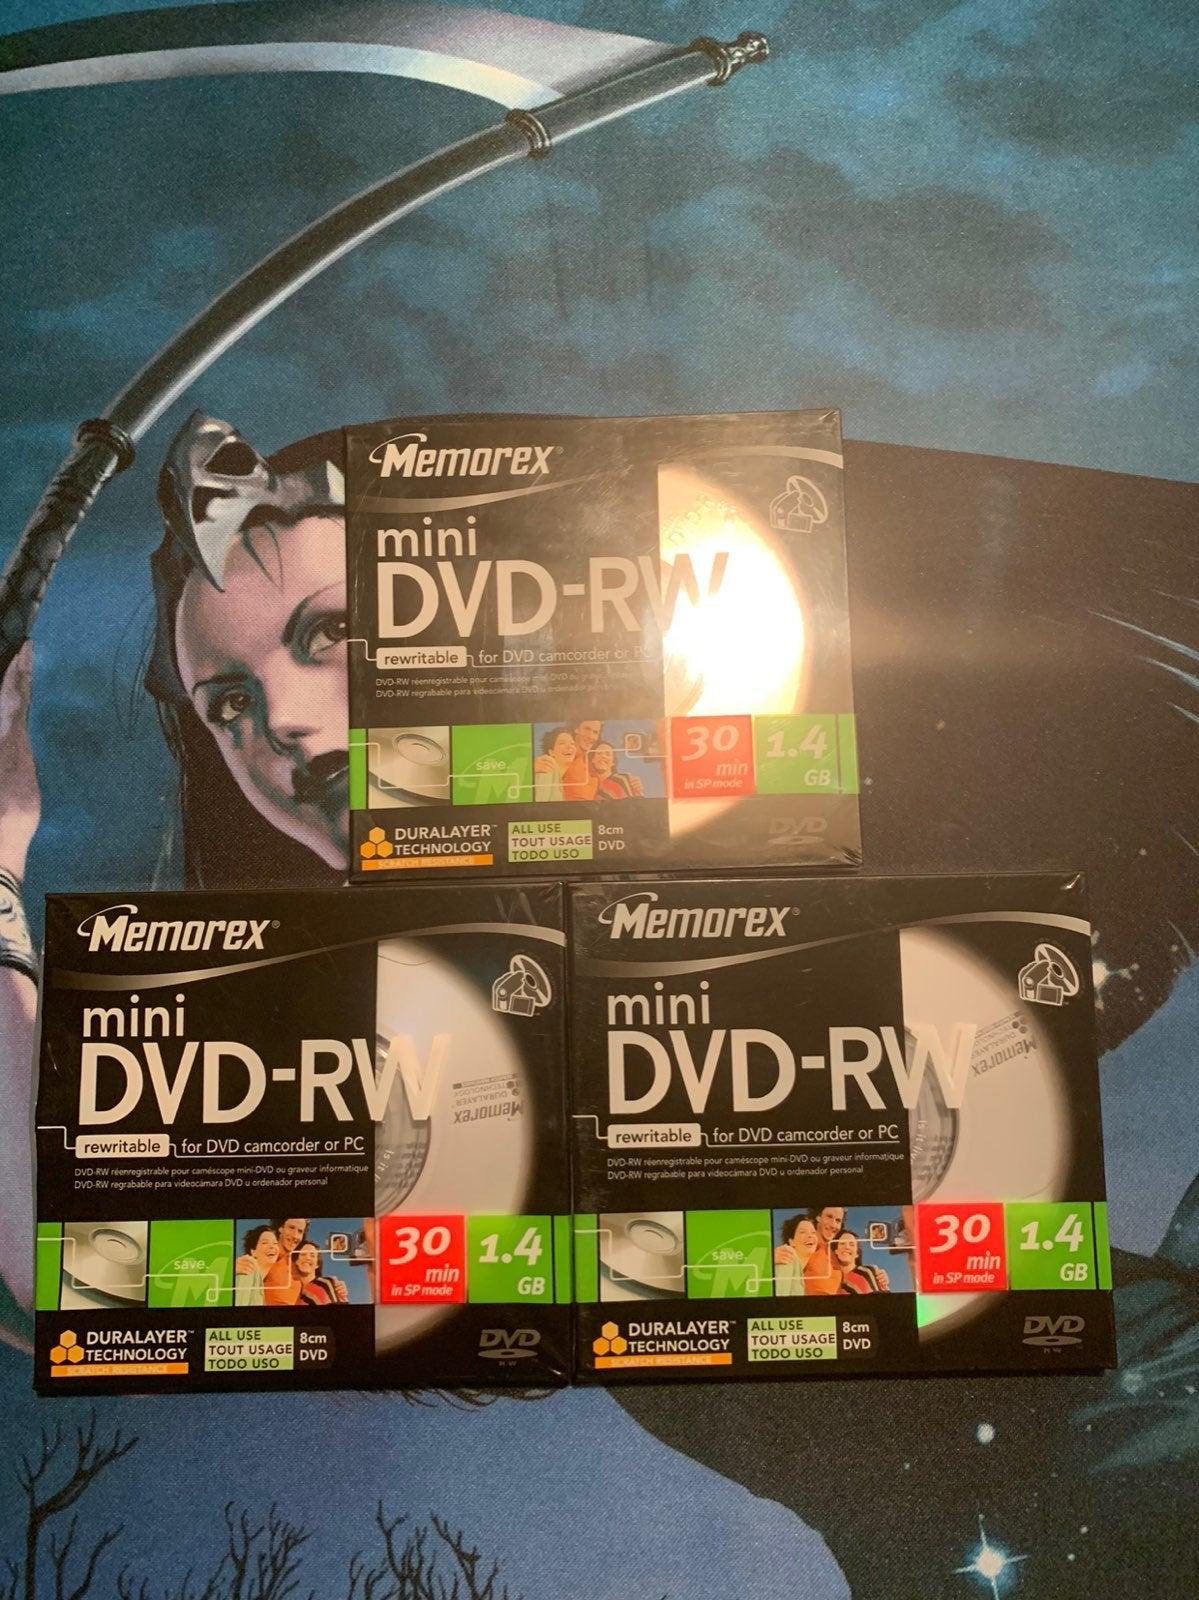 Memorex Mini DVD-RW